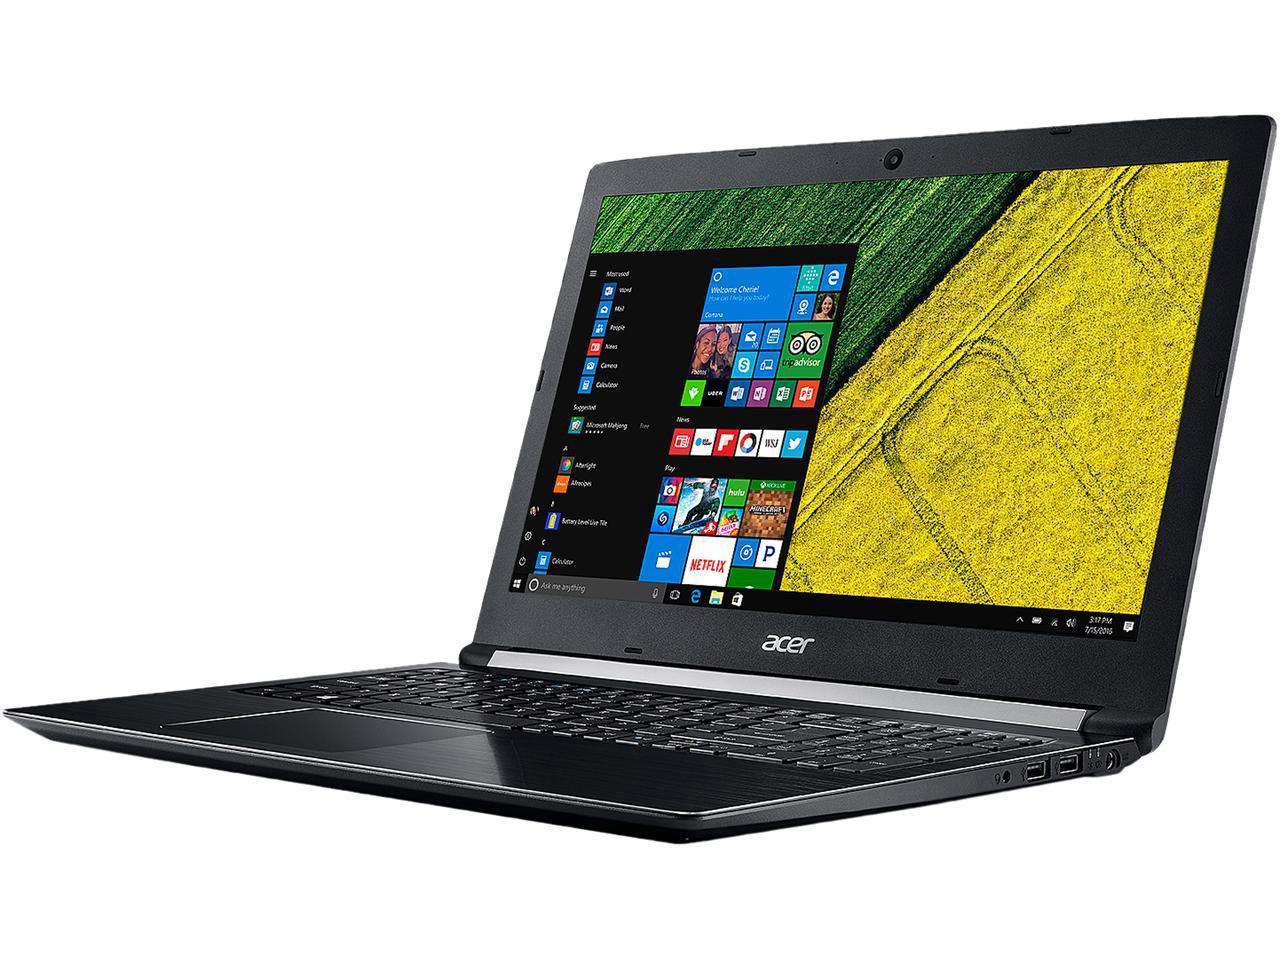 Acer Aspire 5 A515-51G-89LS: 15.6'' FHD, i7-8550U, 8GB DDR4, 256GB SSD, MX150 2GB, Win10H @ $600 + F/S